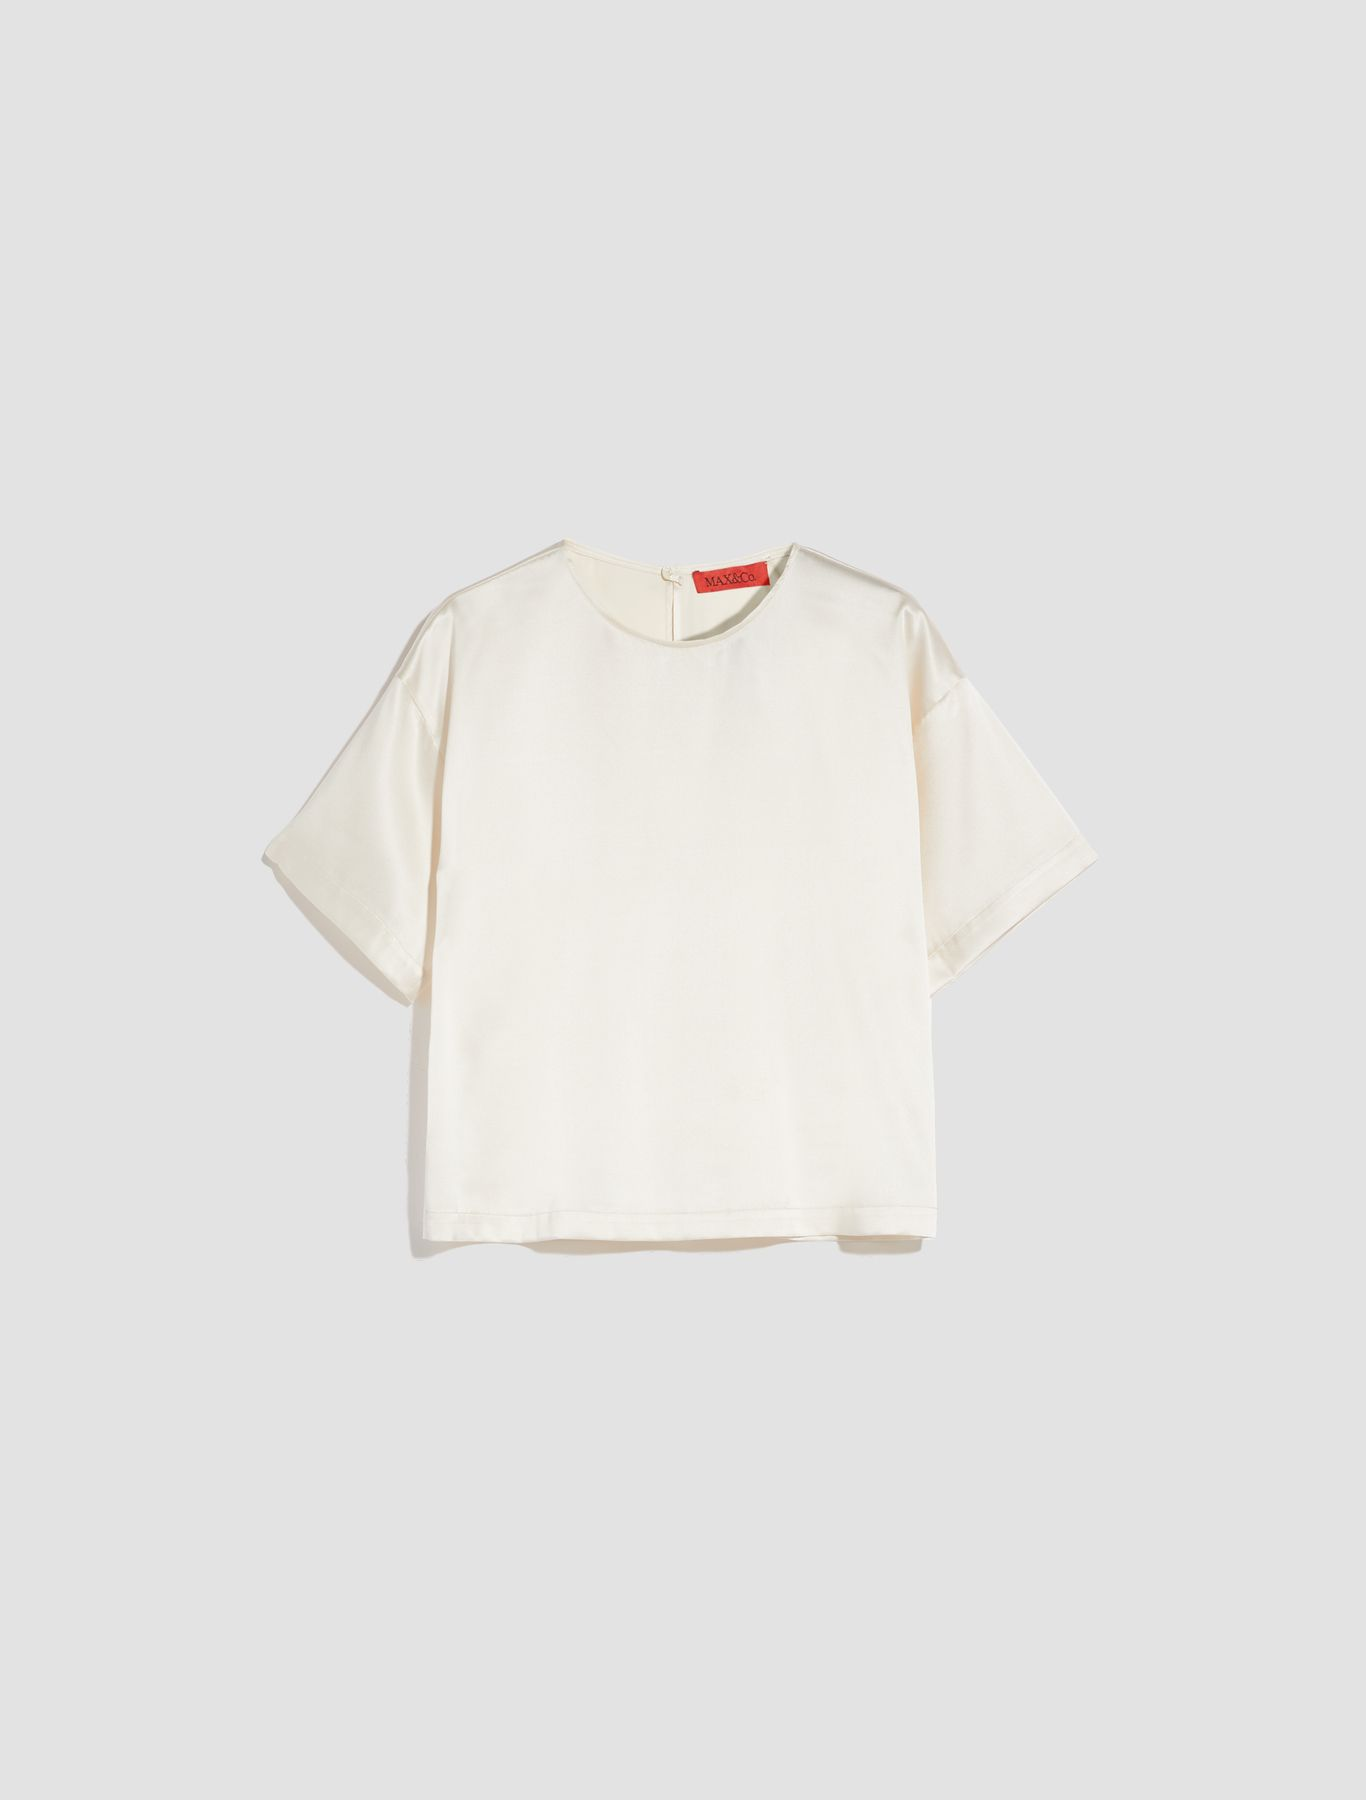 DENTISTA Shirt ivory 5